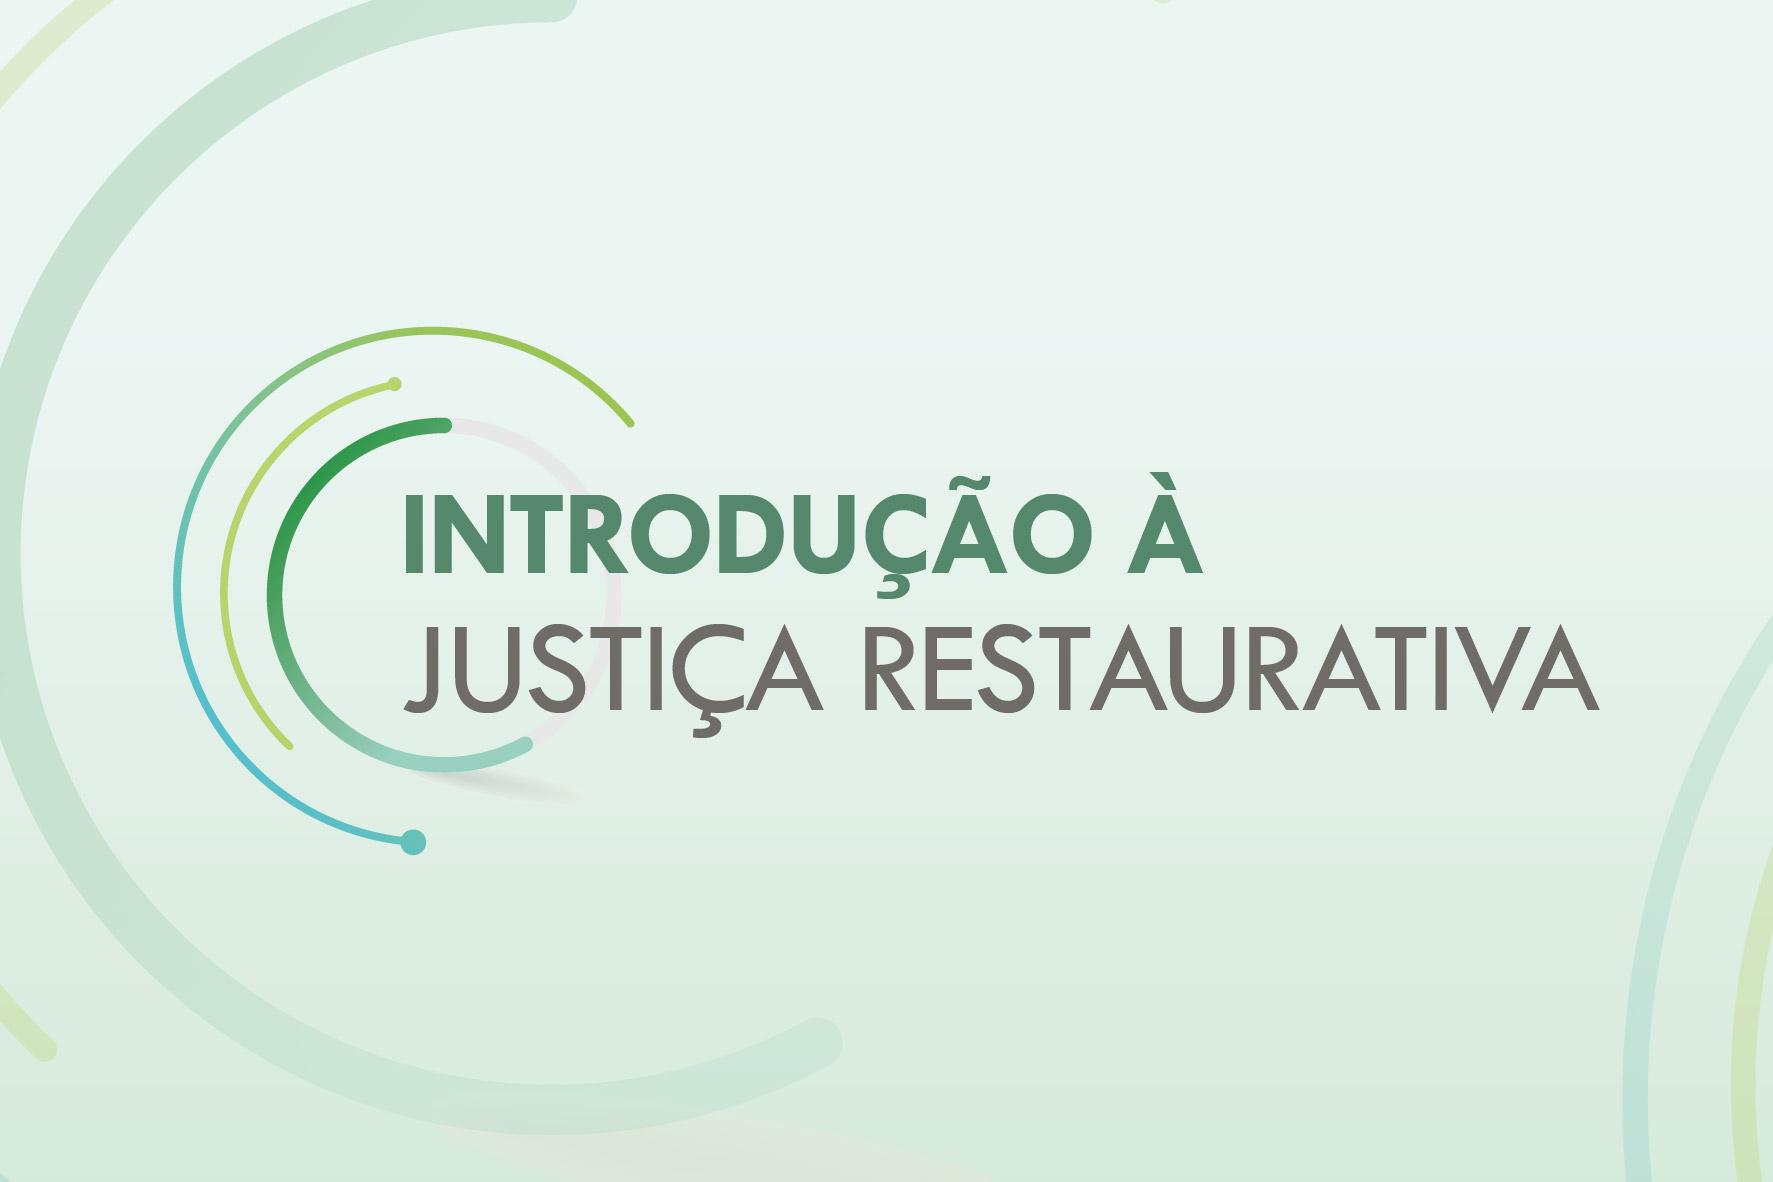 Logo - Introdução à Justiça Restaurativa